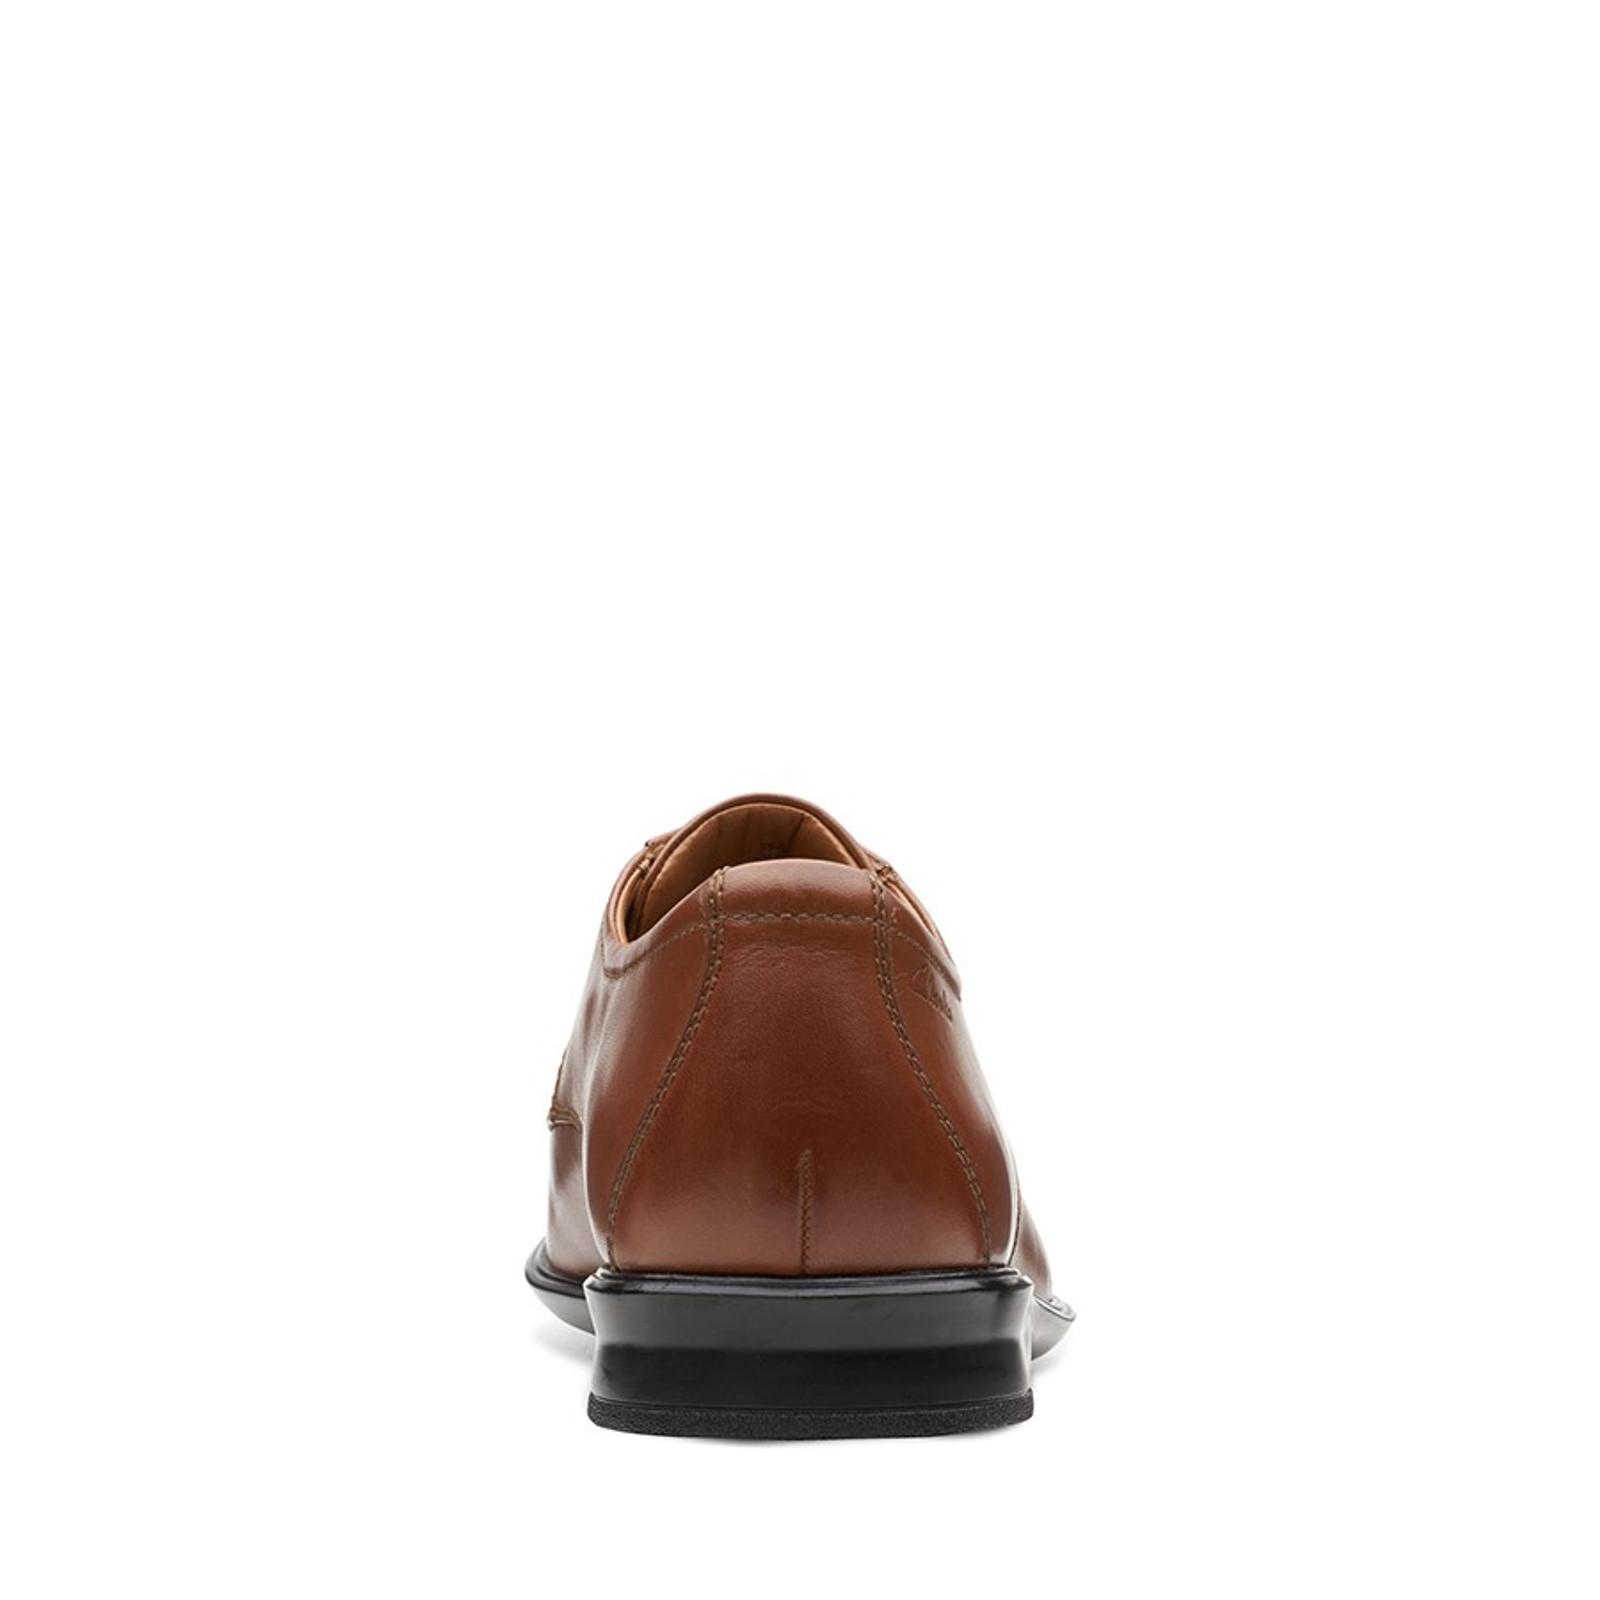 Clarks Mens BENSLEY LACE Dark Tan Leather